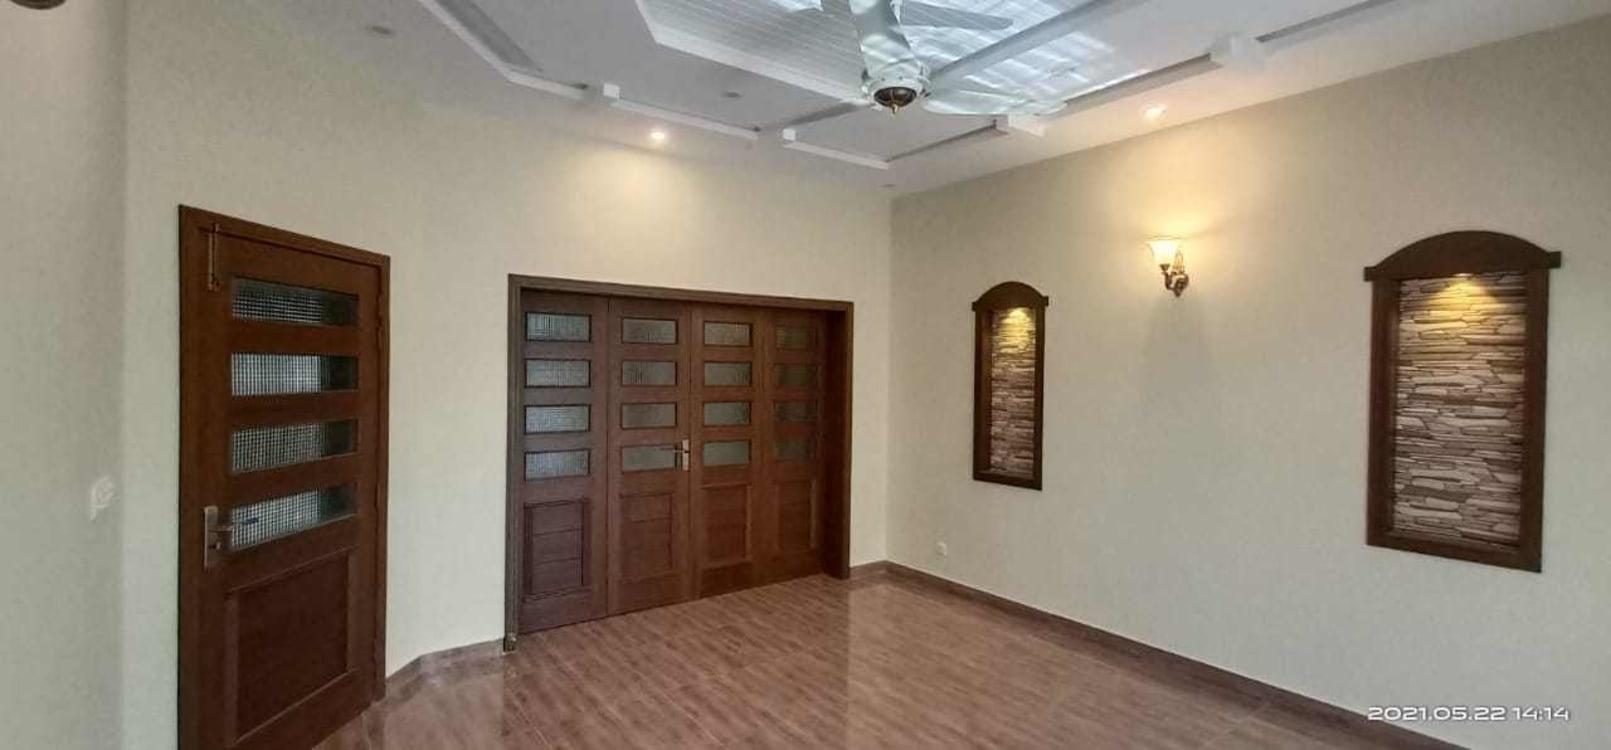 1 Kanal Upper Portion for Rent  | Graana.com